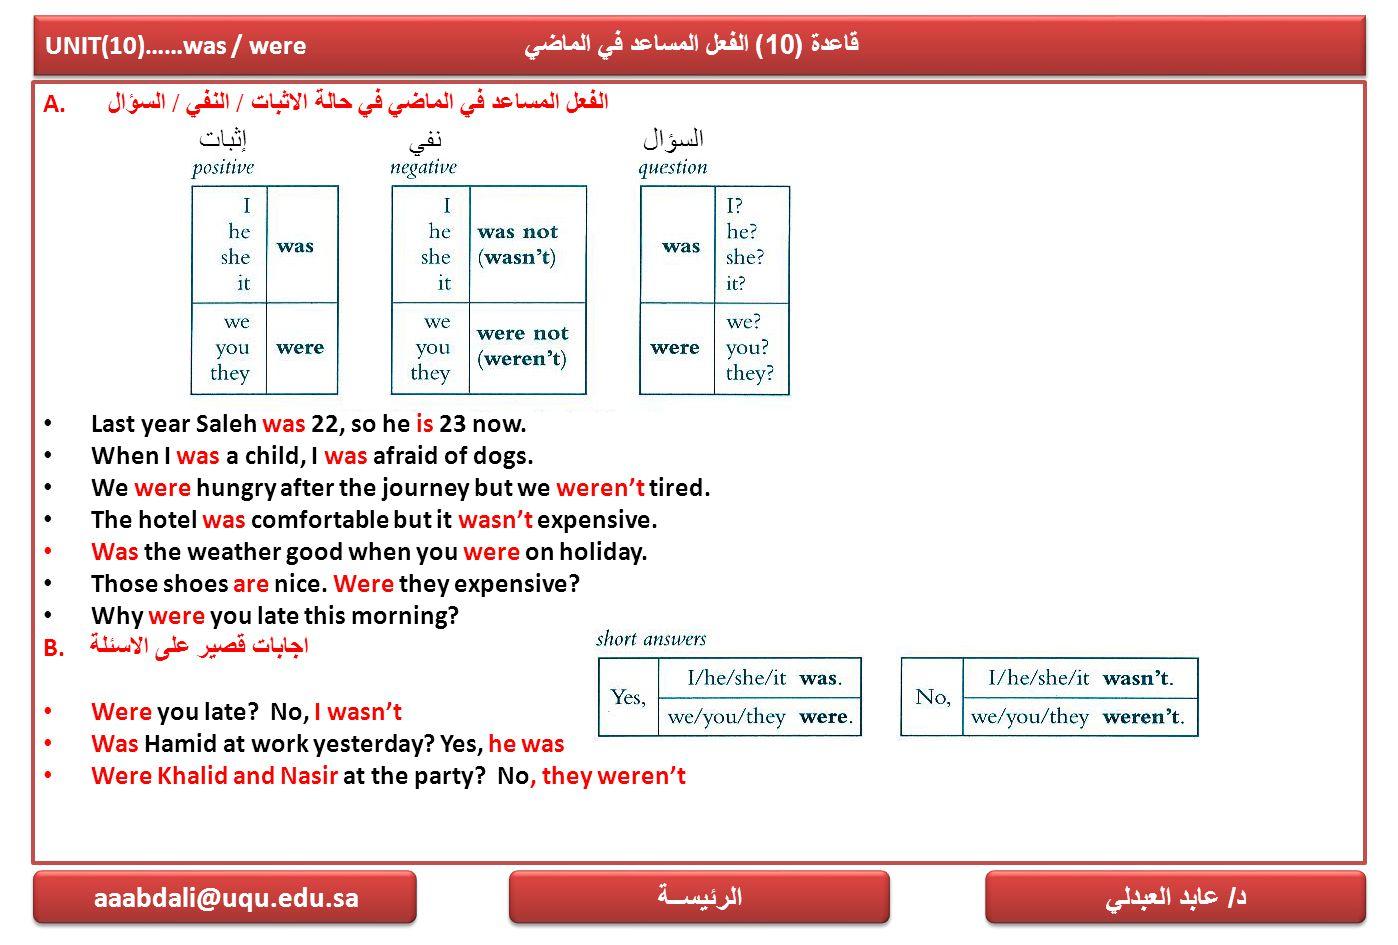 UNIT(10)……was / were قاعدة (10) الفعل المساعد في الماضي